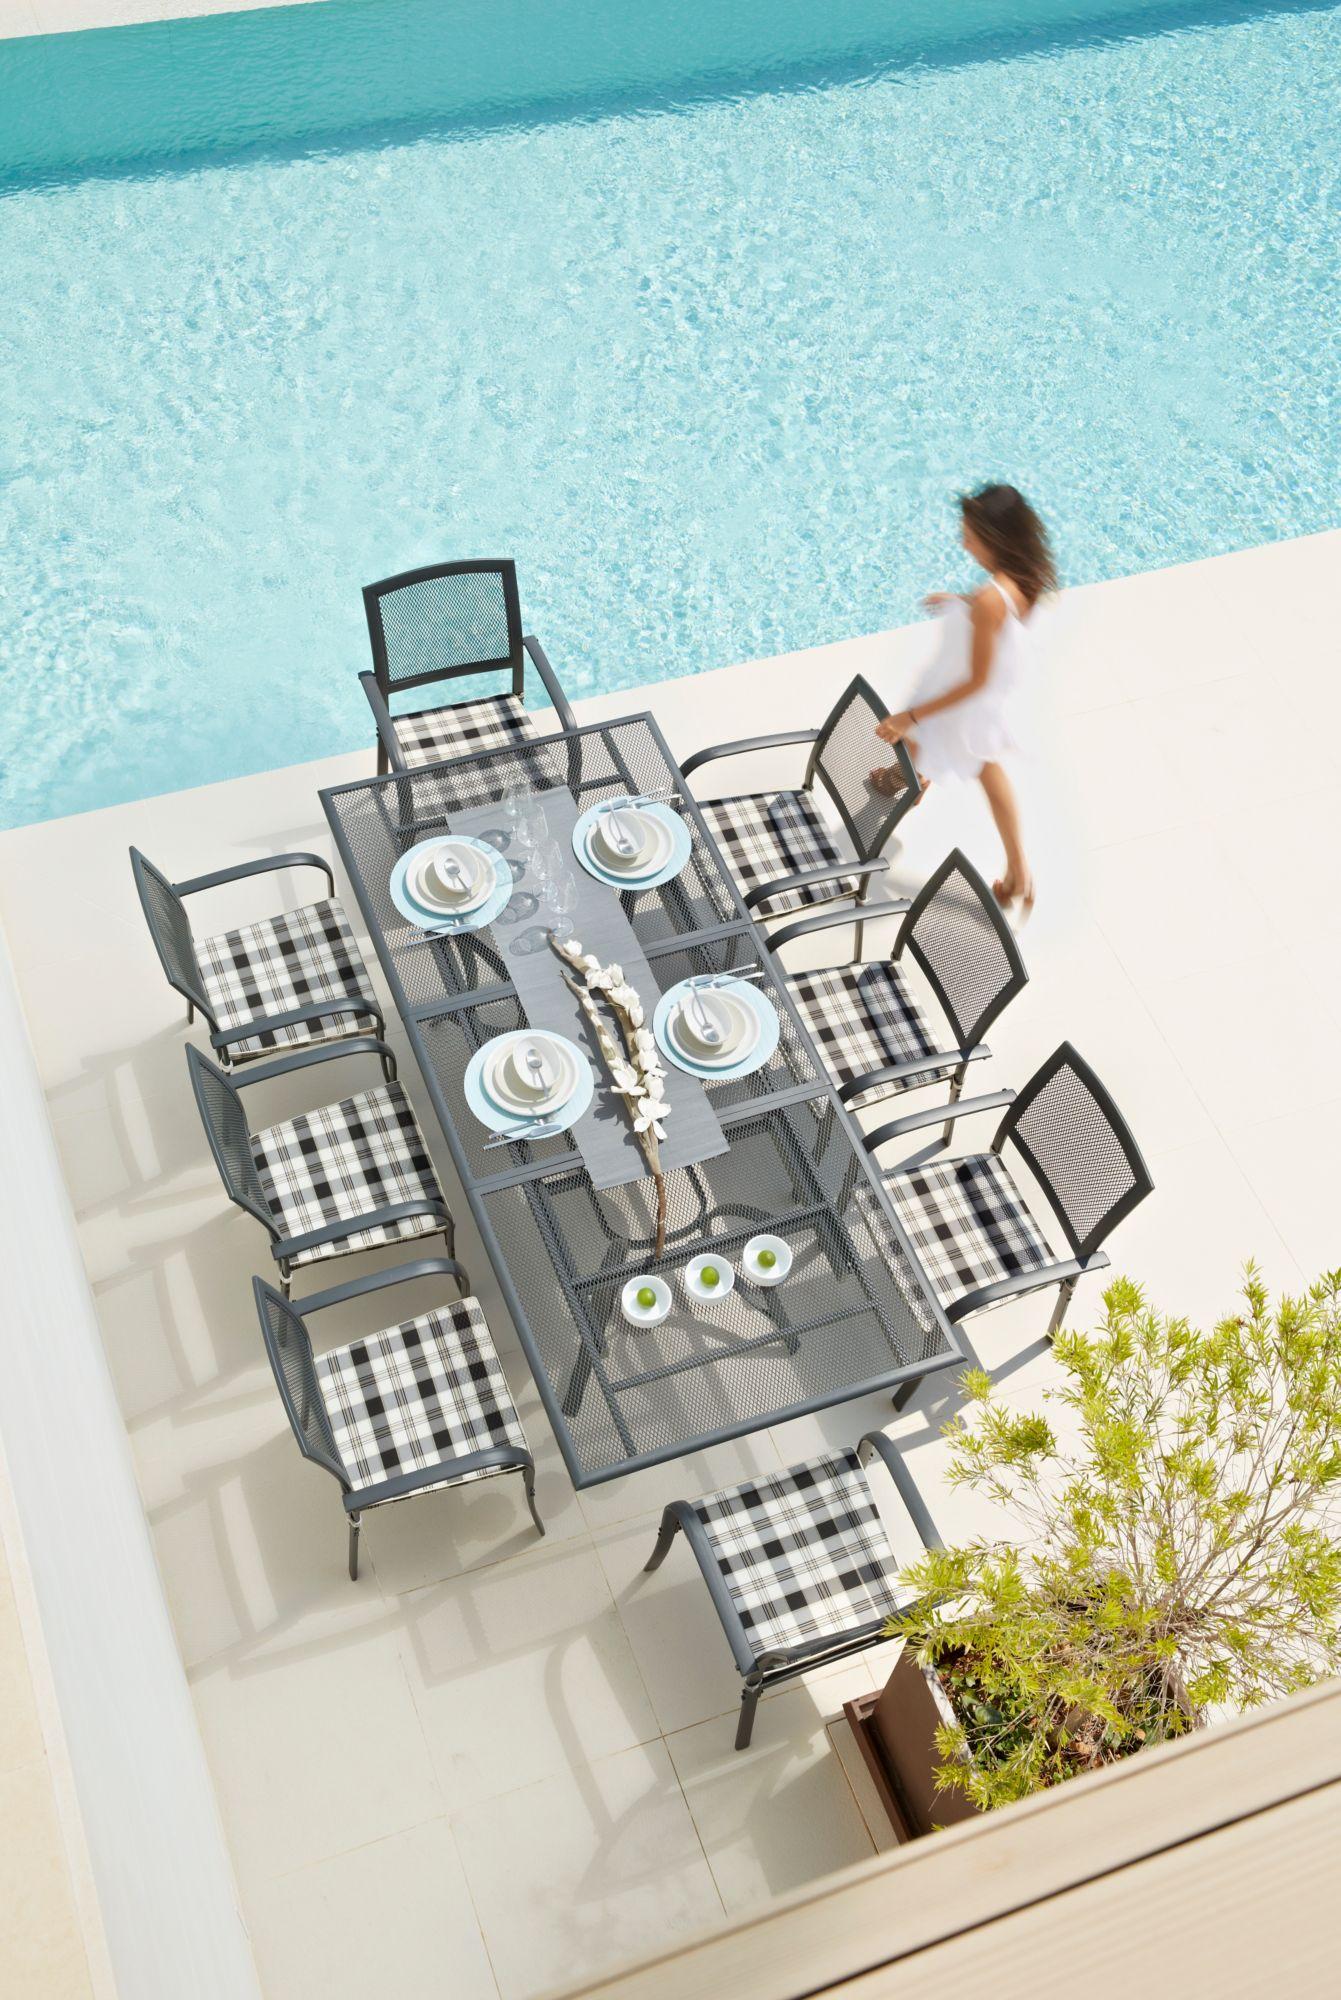 17-tgl. Gartenmöbelset »Montreal«, 8 Sessel + Auflagen, Tisch180-240 cm, Alu/Textil